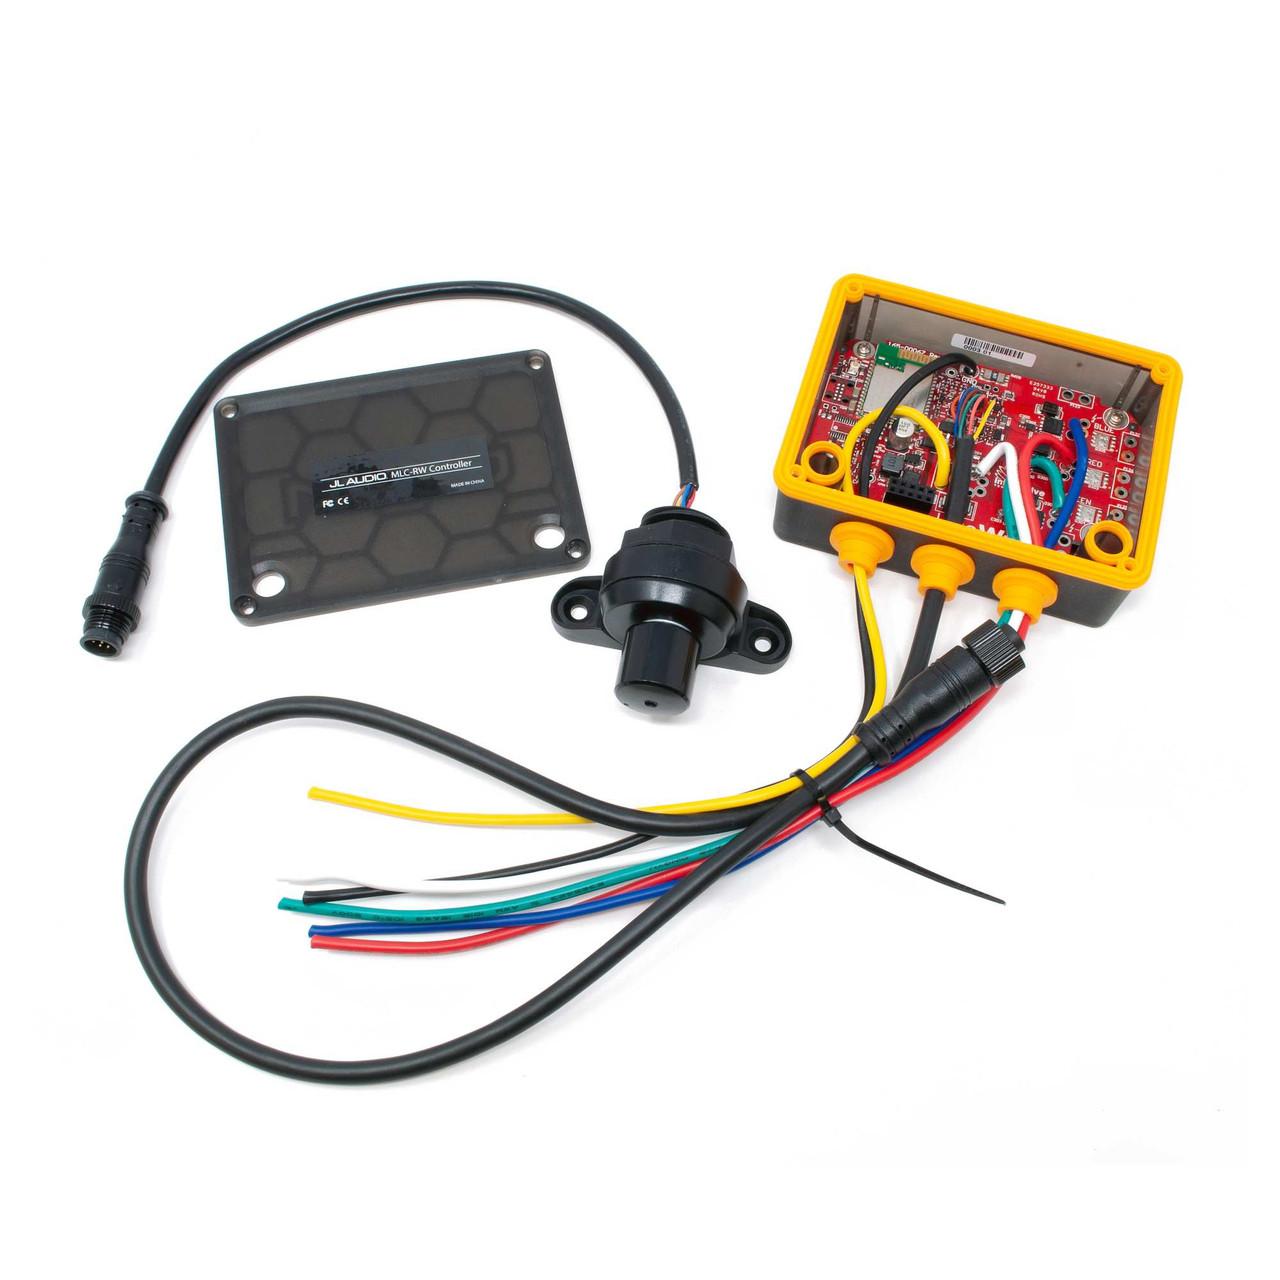 jl audio mlc rw marine led lighting controller with wifi [ 1280 x 1280 Pixel ]